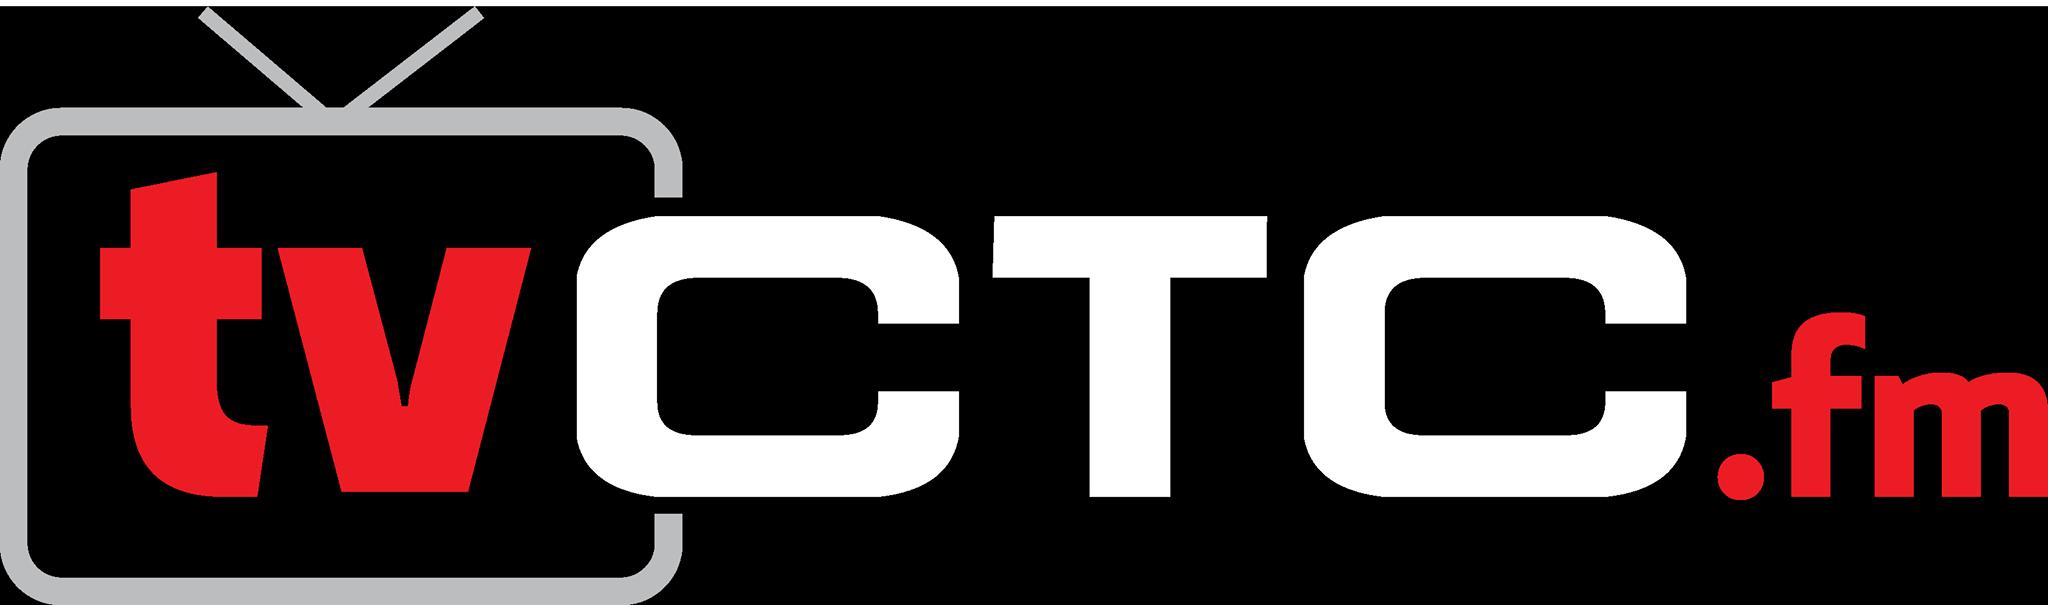 TVCTC.FM